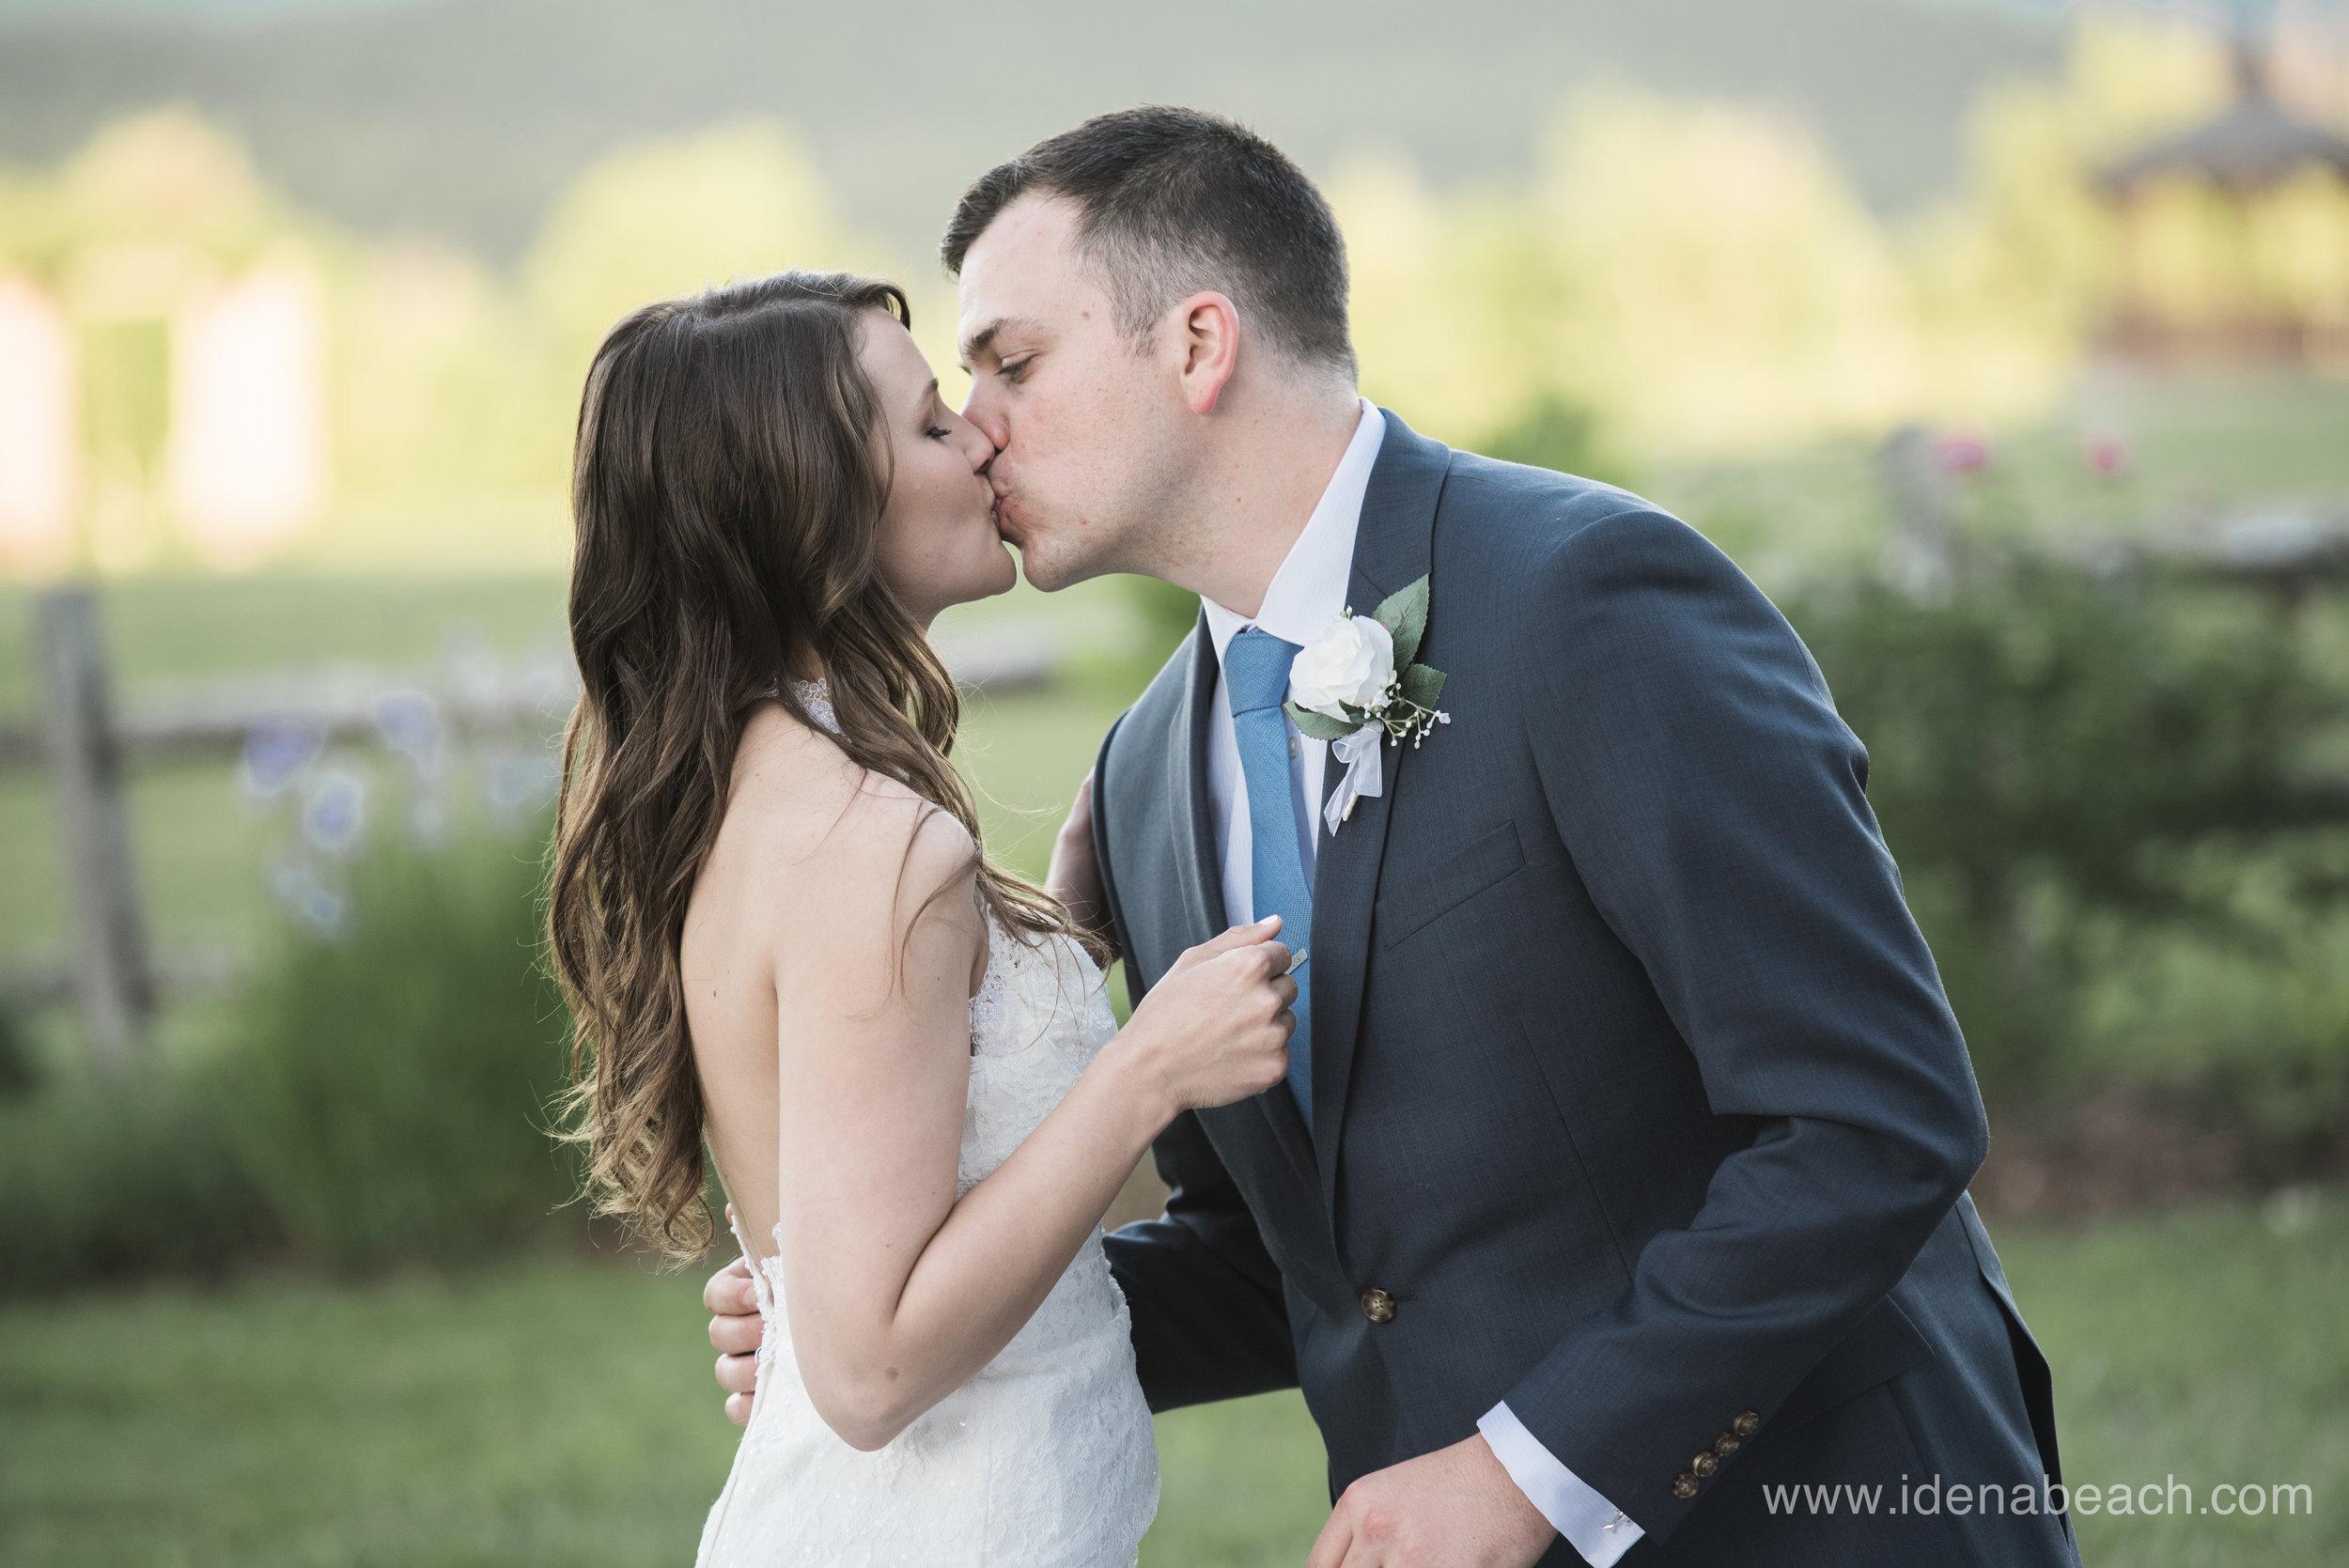 Mountain-Top-Inn-Vermont-Wedding-Photographer-128.jpg